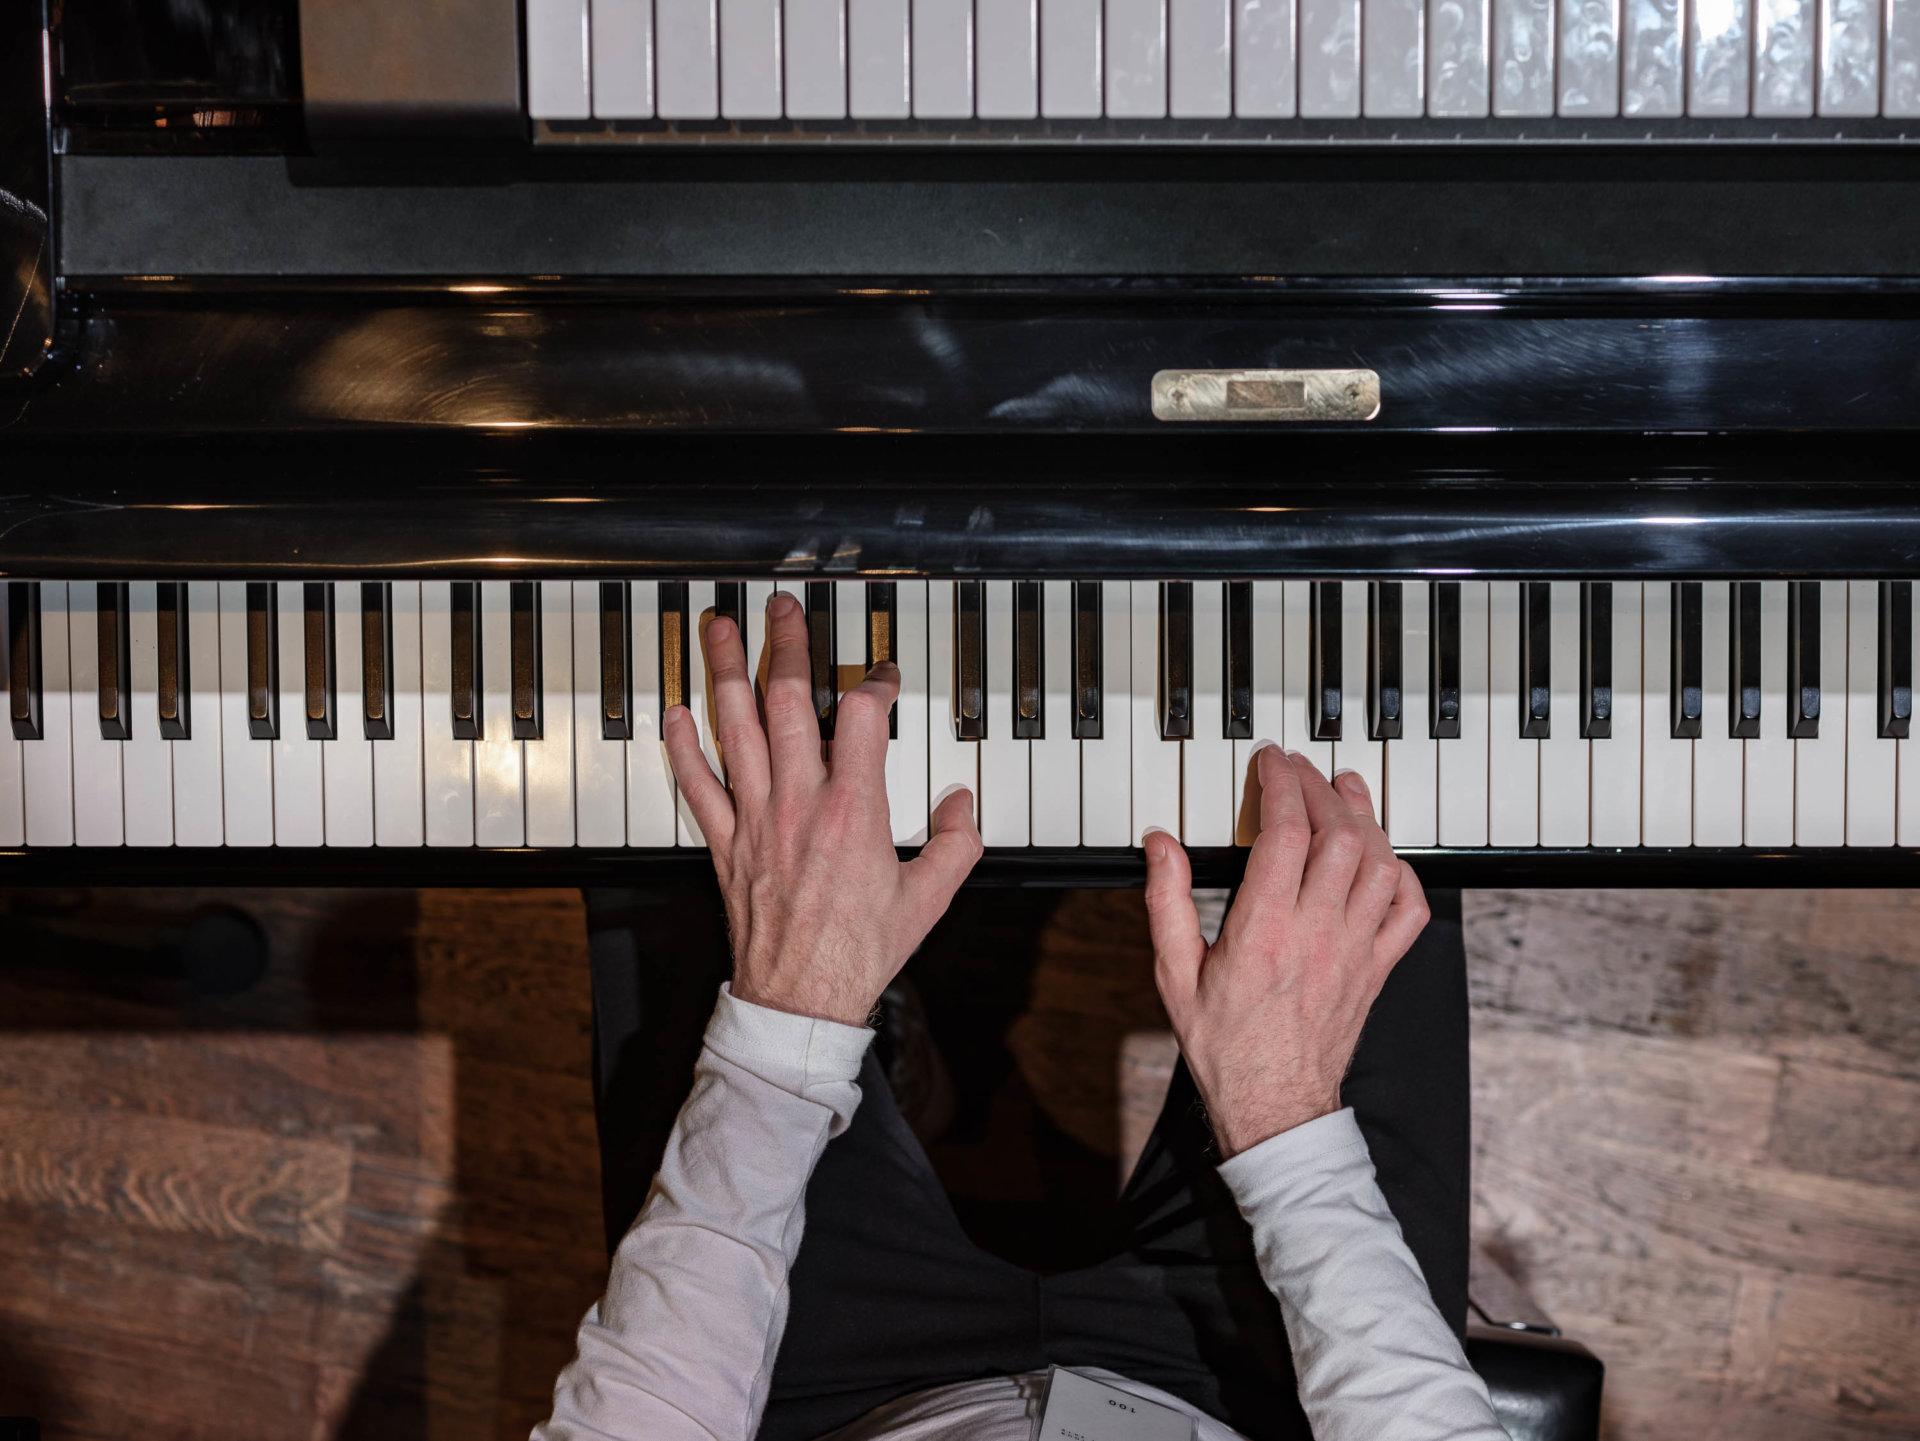 Gewandhaus, Island, Kultur, Pianist, Projekt, Serie, klavier, konzert, meisterfinger, musiker, piano, Ólafur_Arnaulds